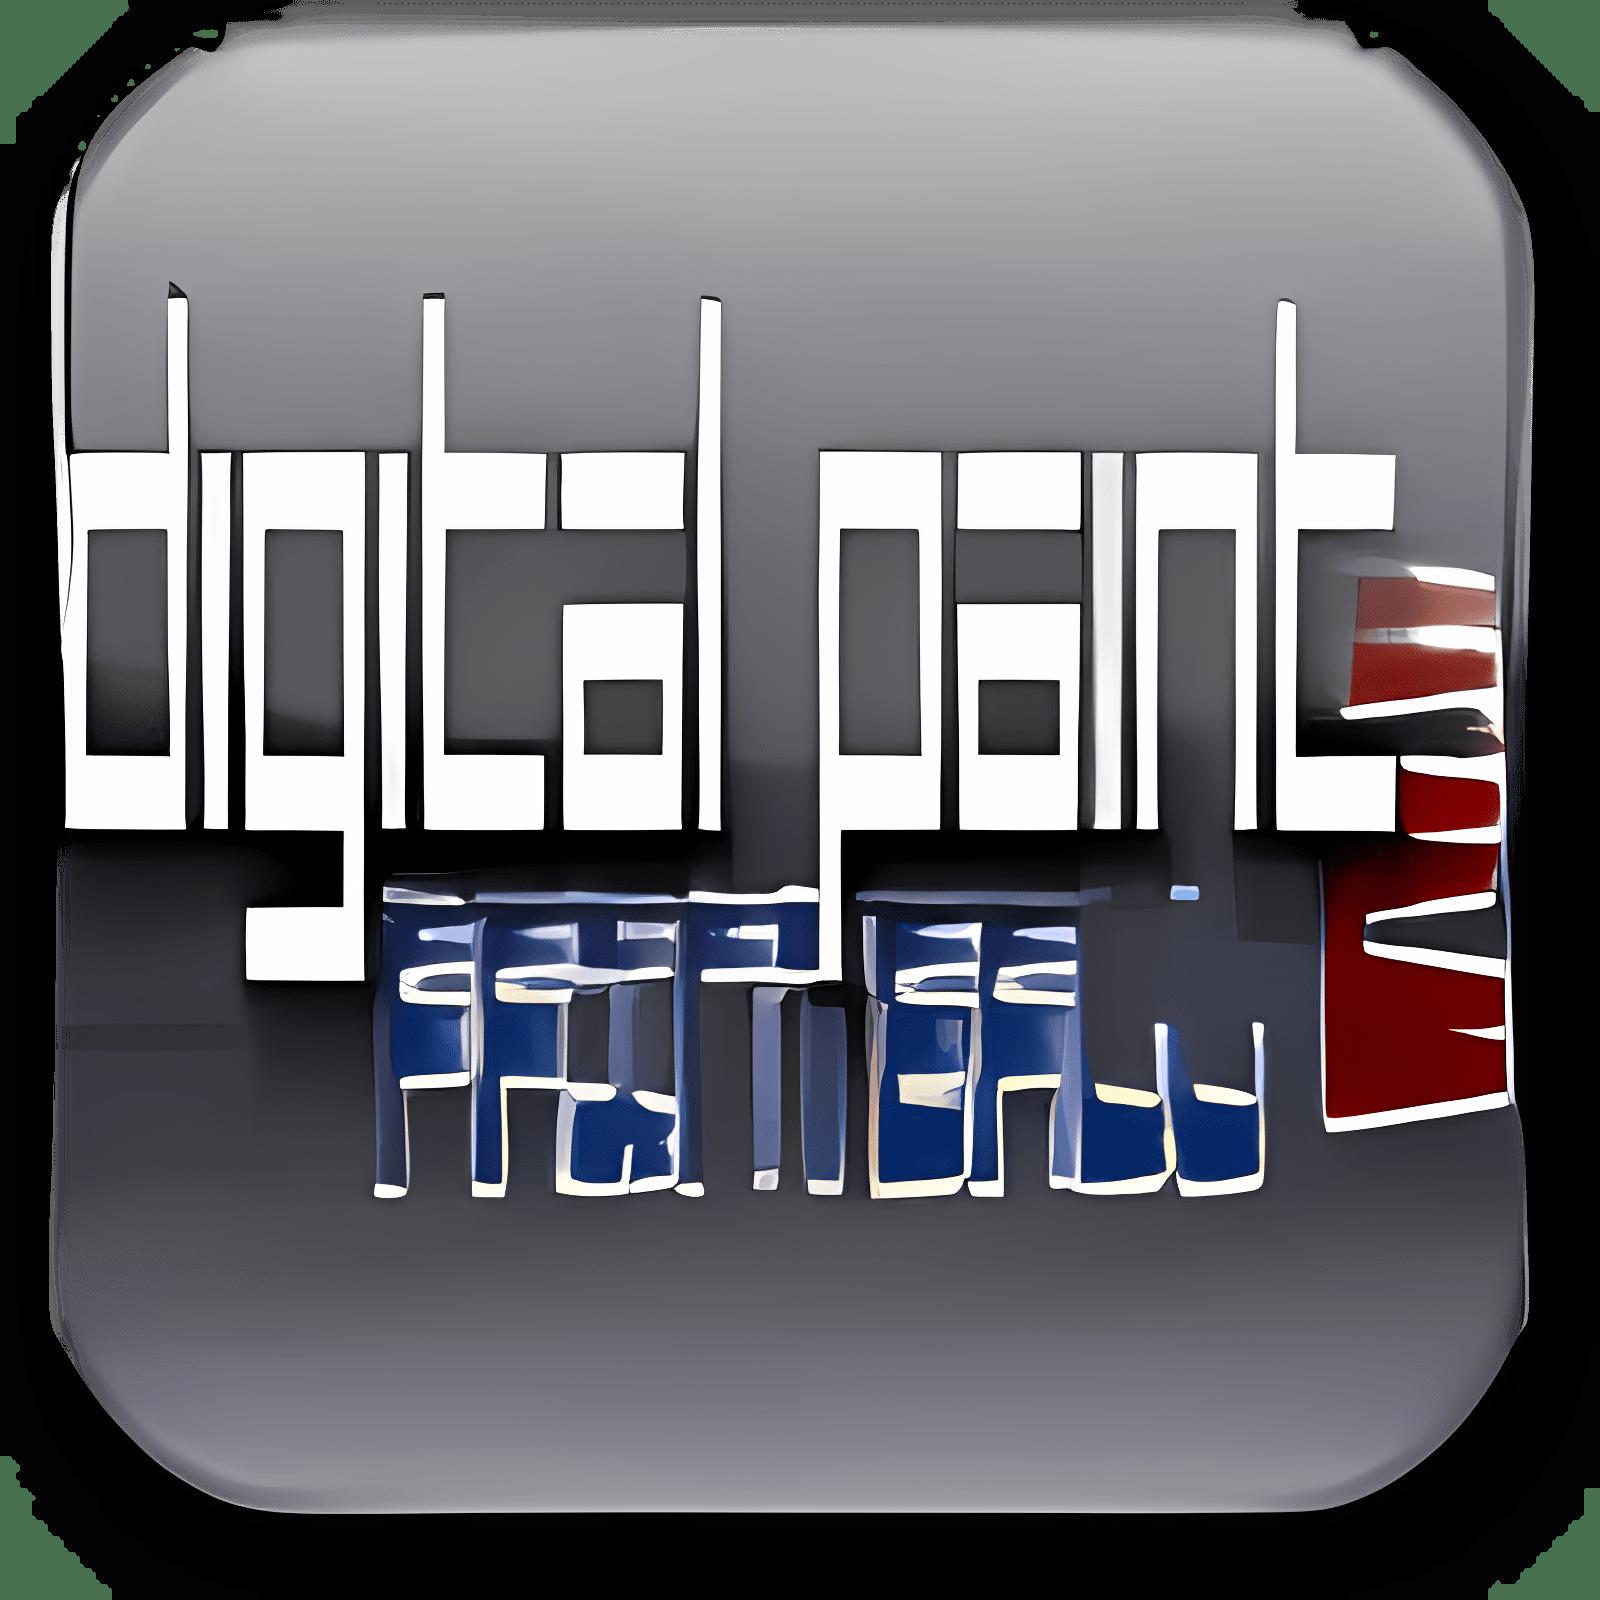 Digital Paint: PaintBall